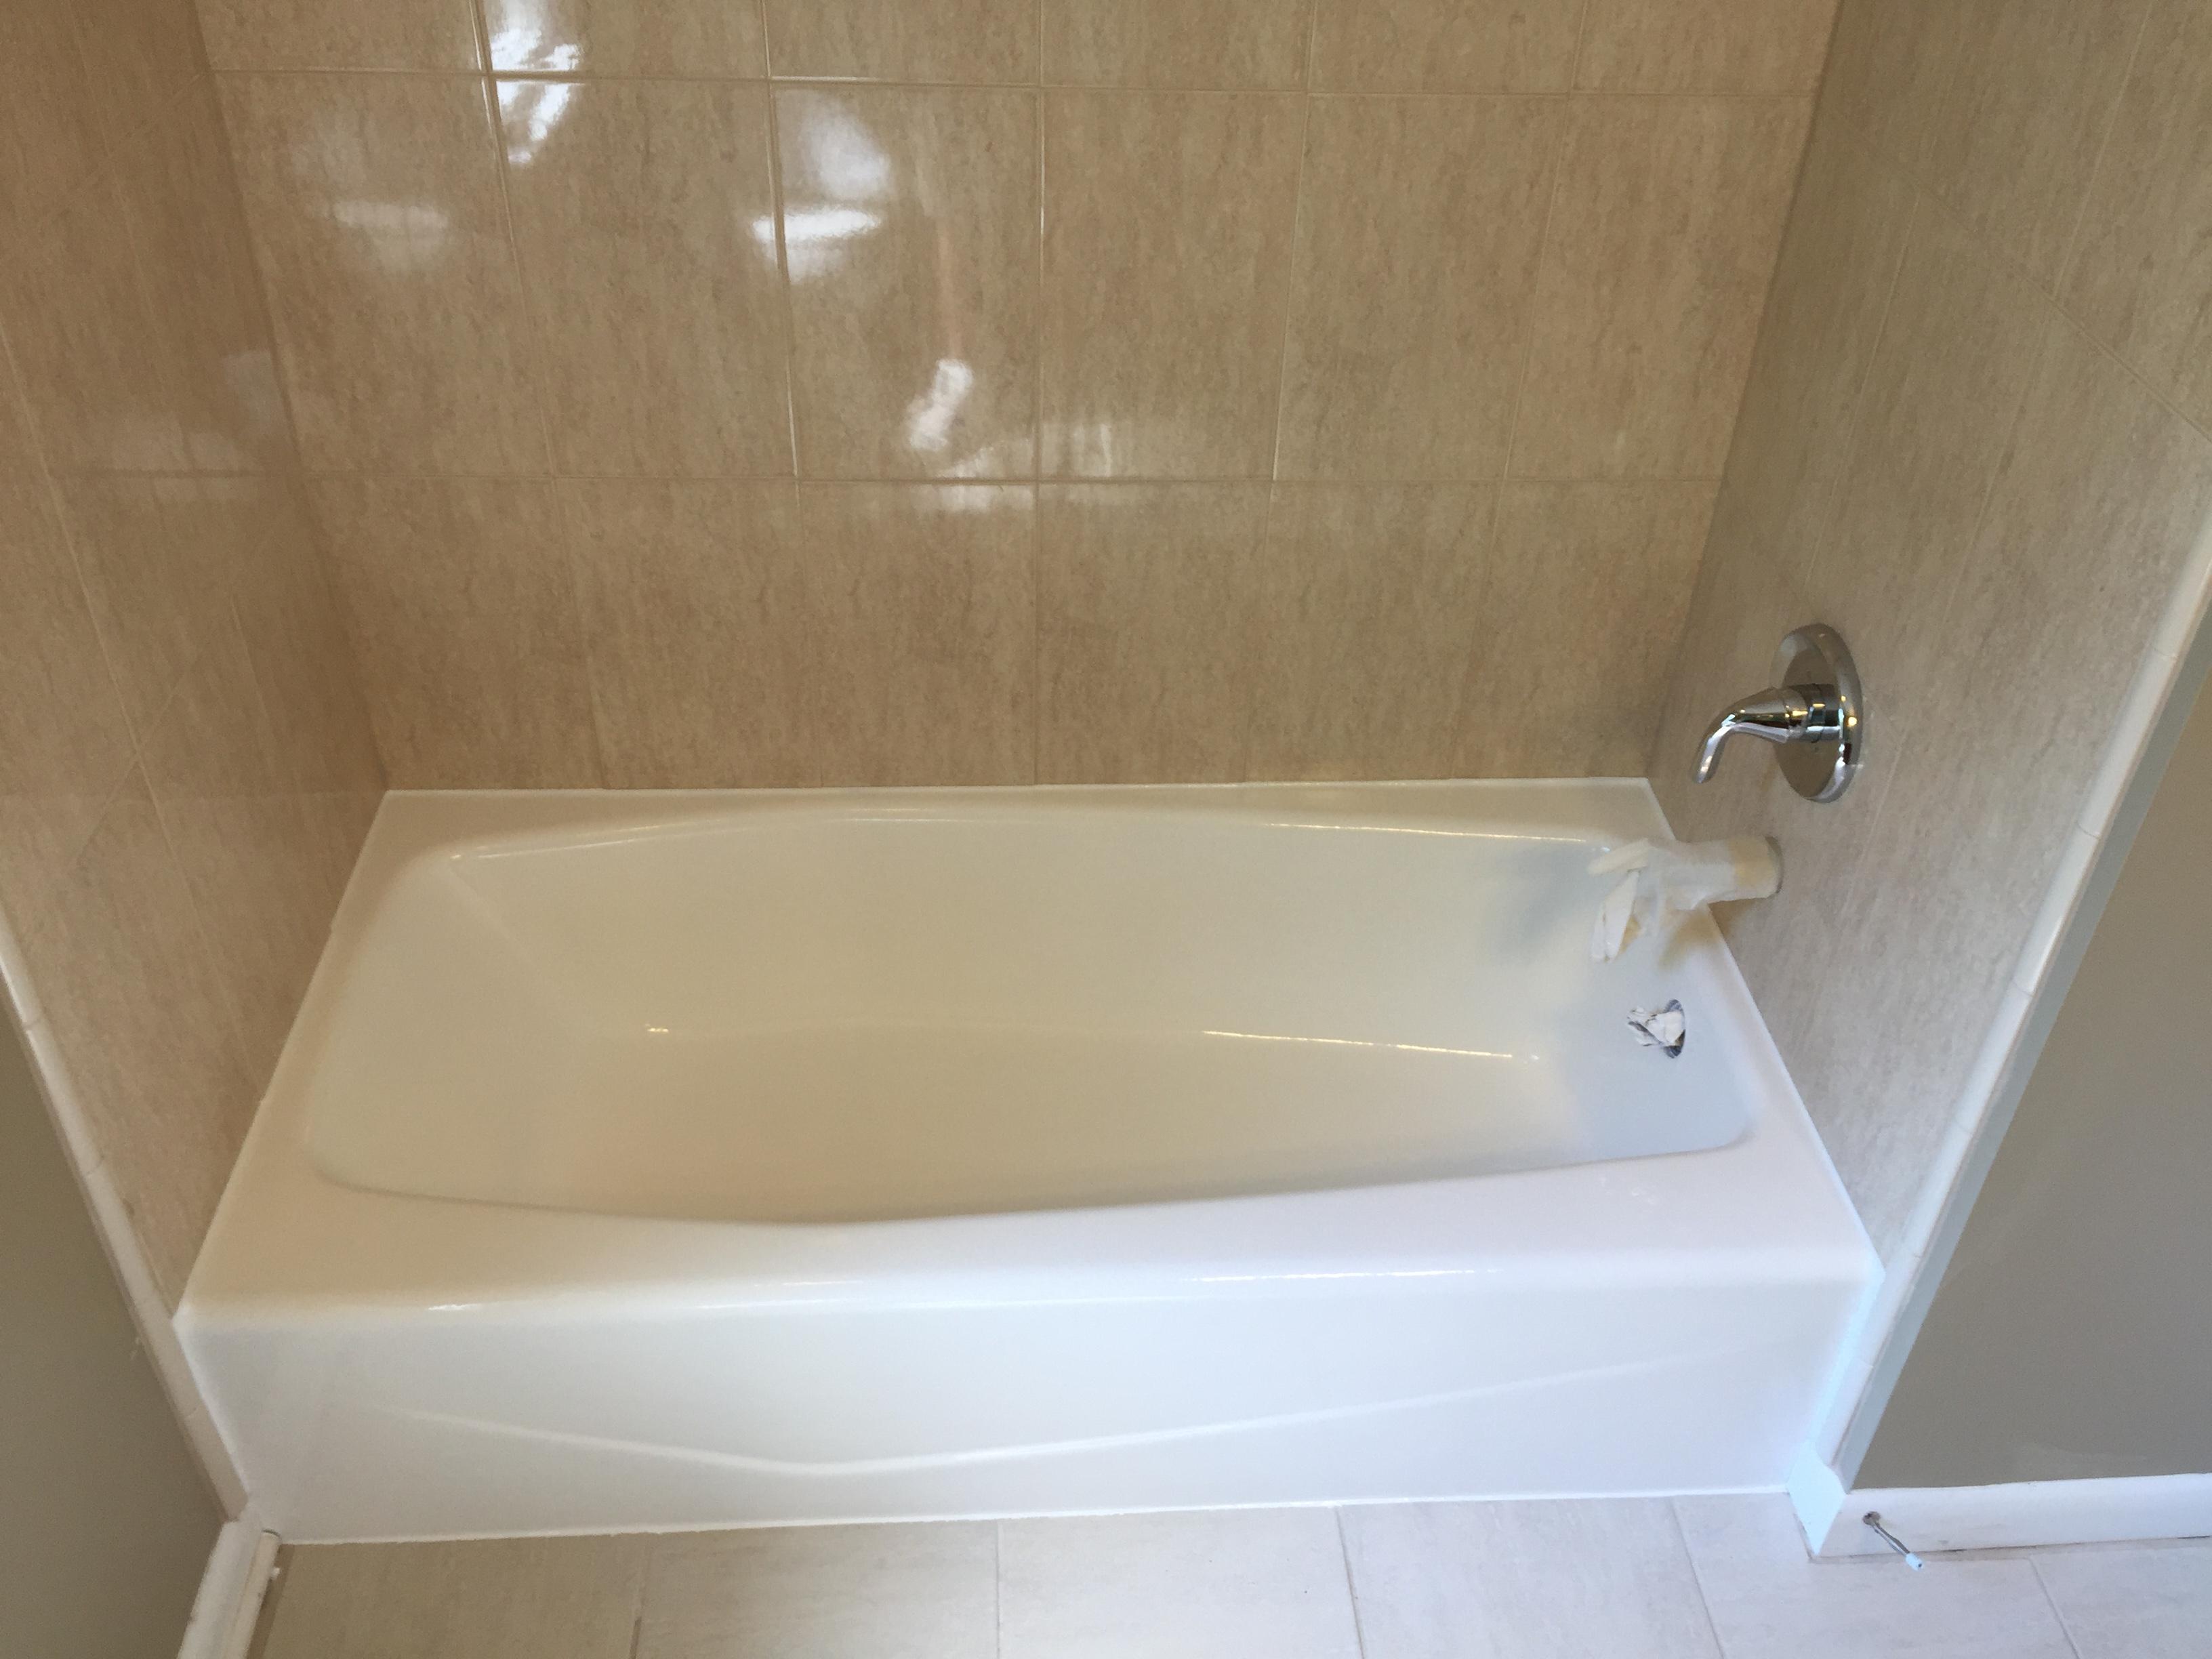 refinishing tubs bathtub restoration tuff resurfacing reglazing tub about img shower